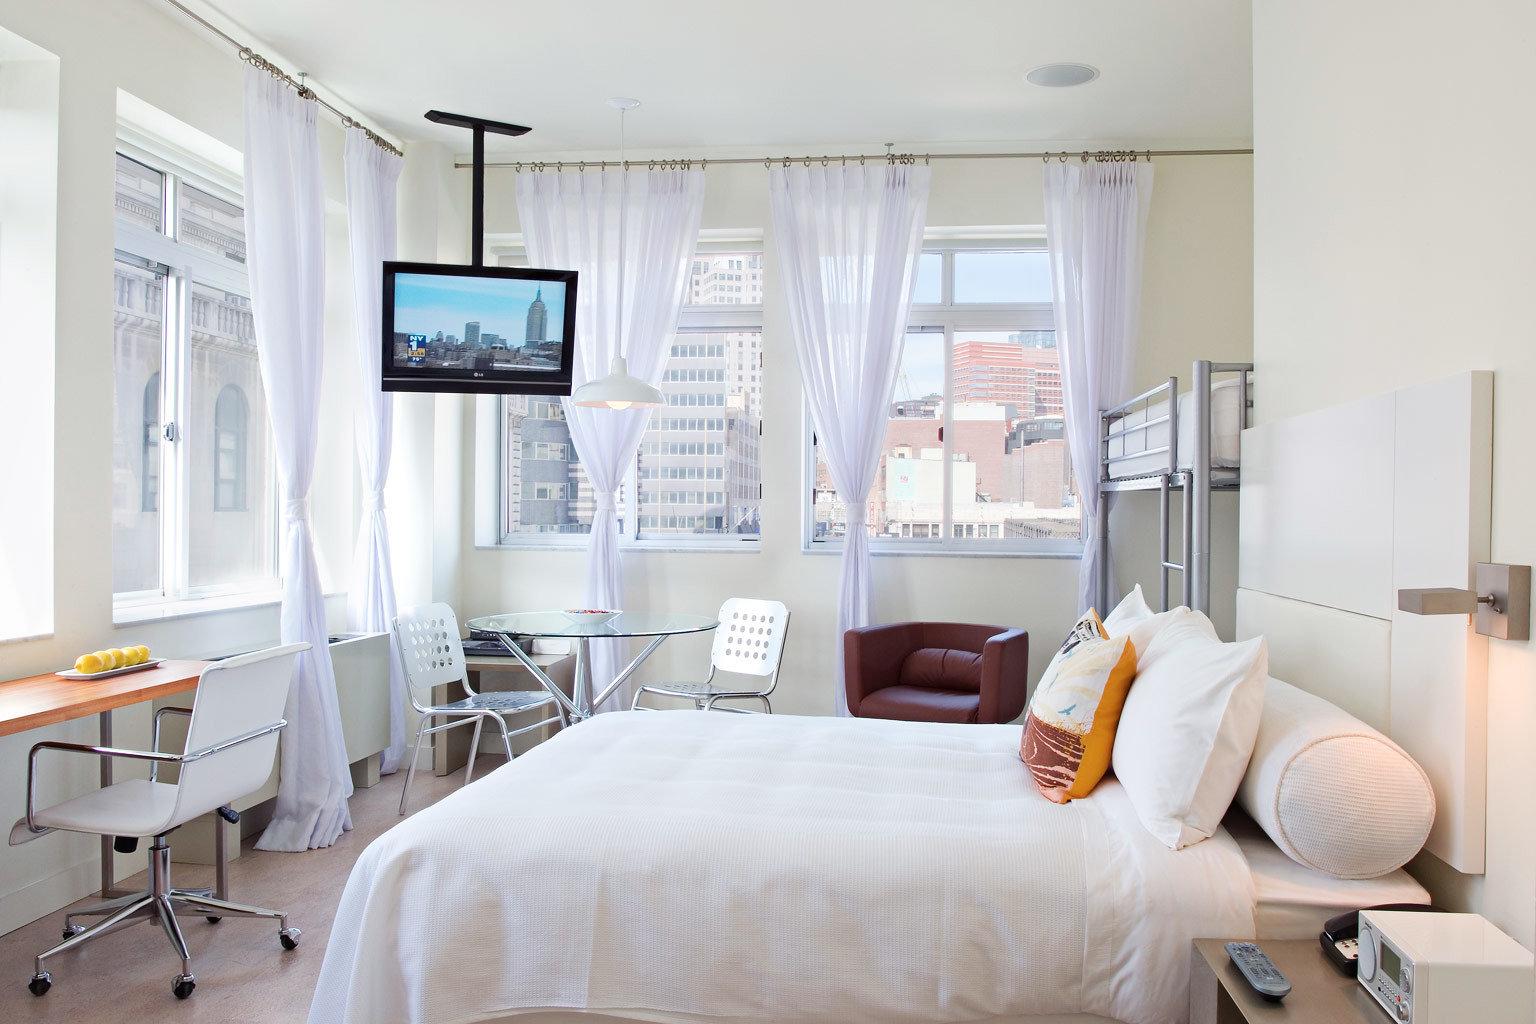 Bedroom Budget City property white living room condominium scene home Suite